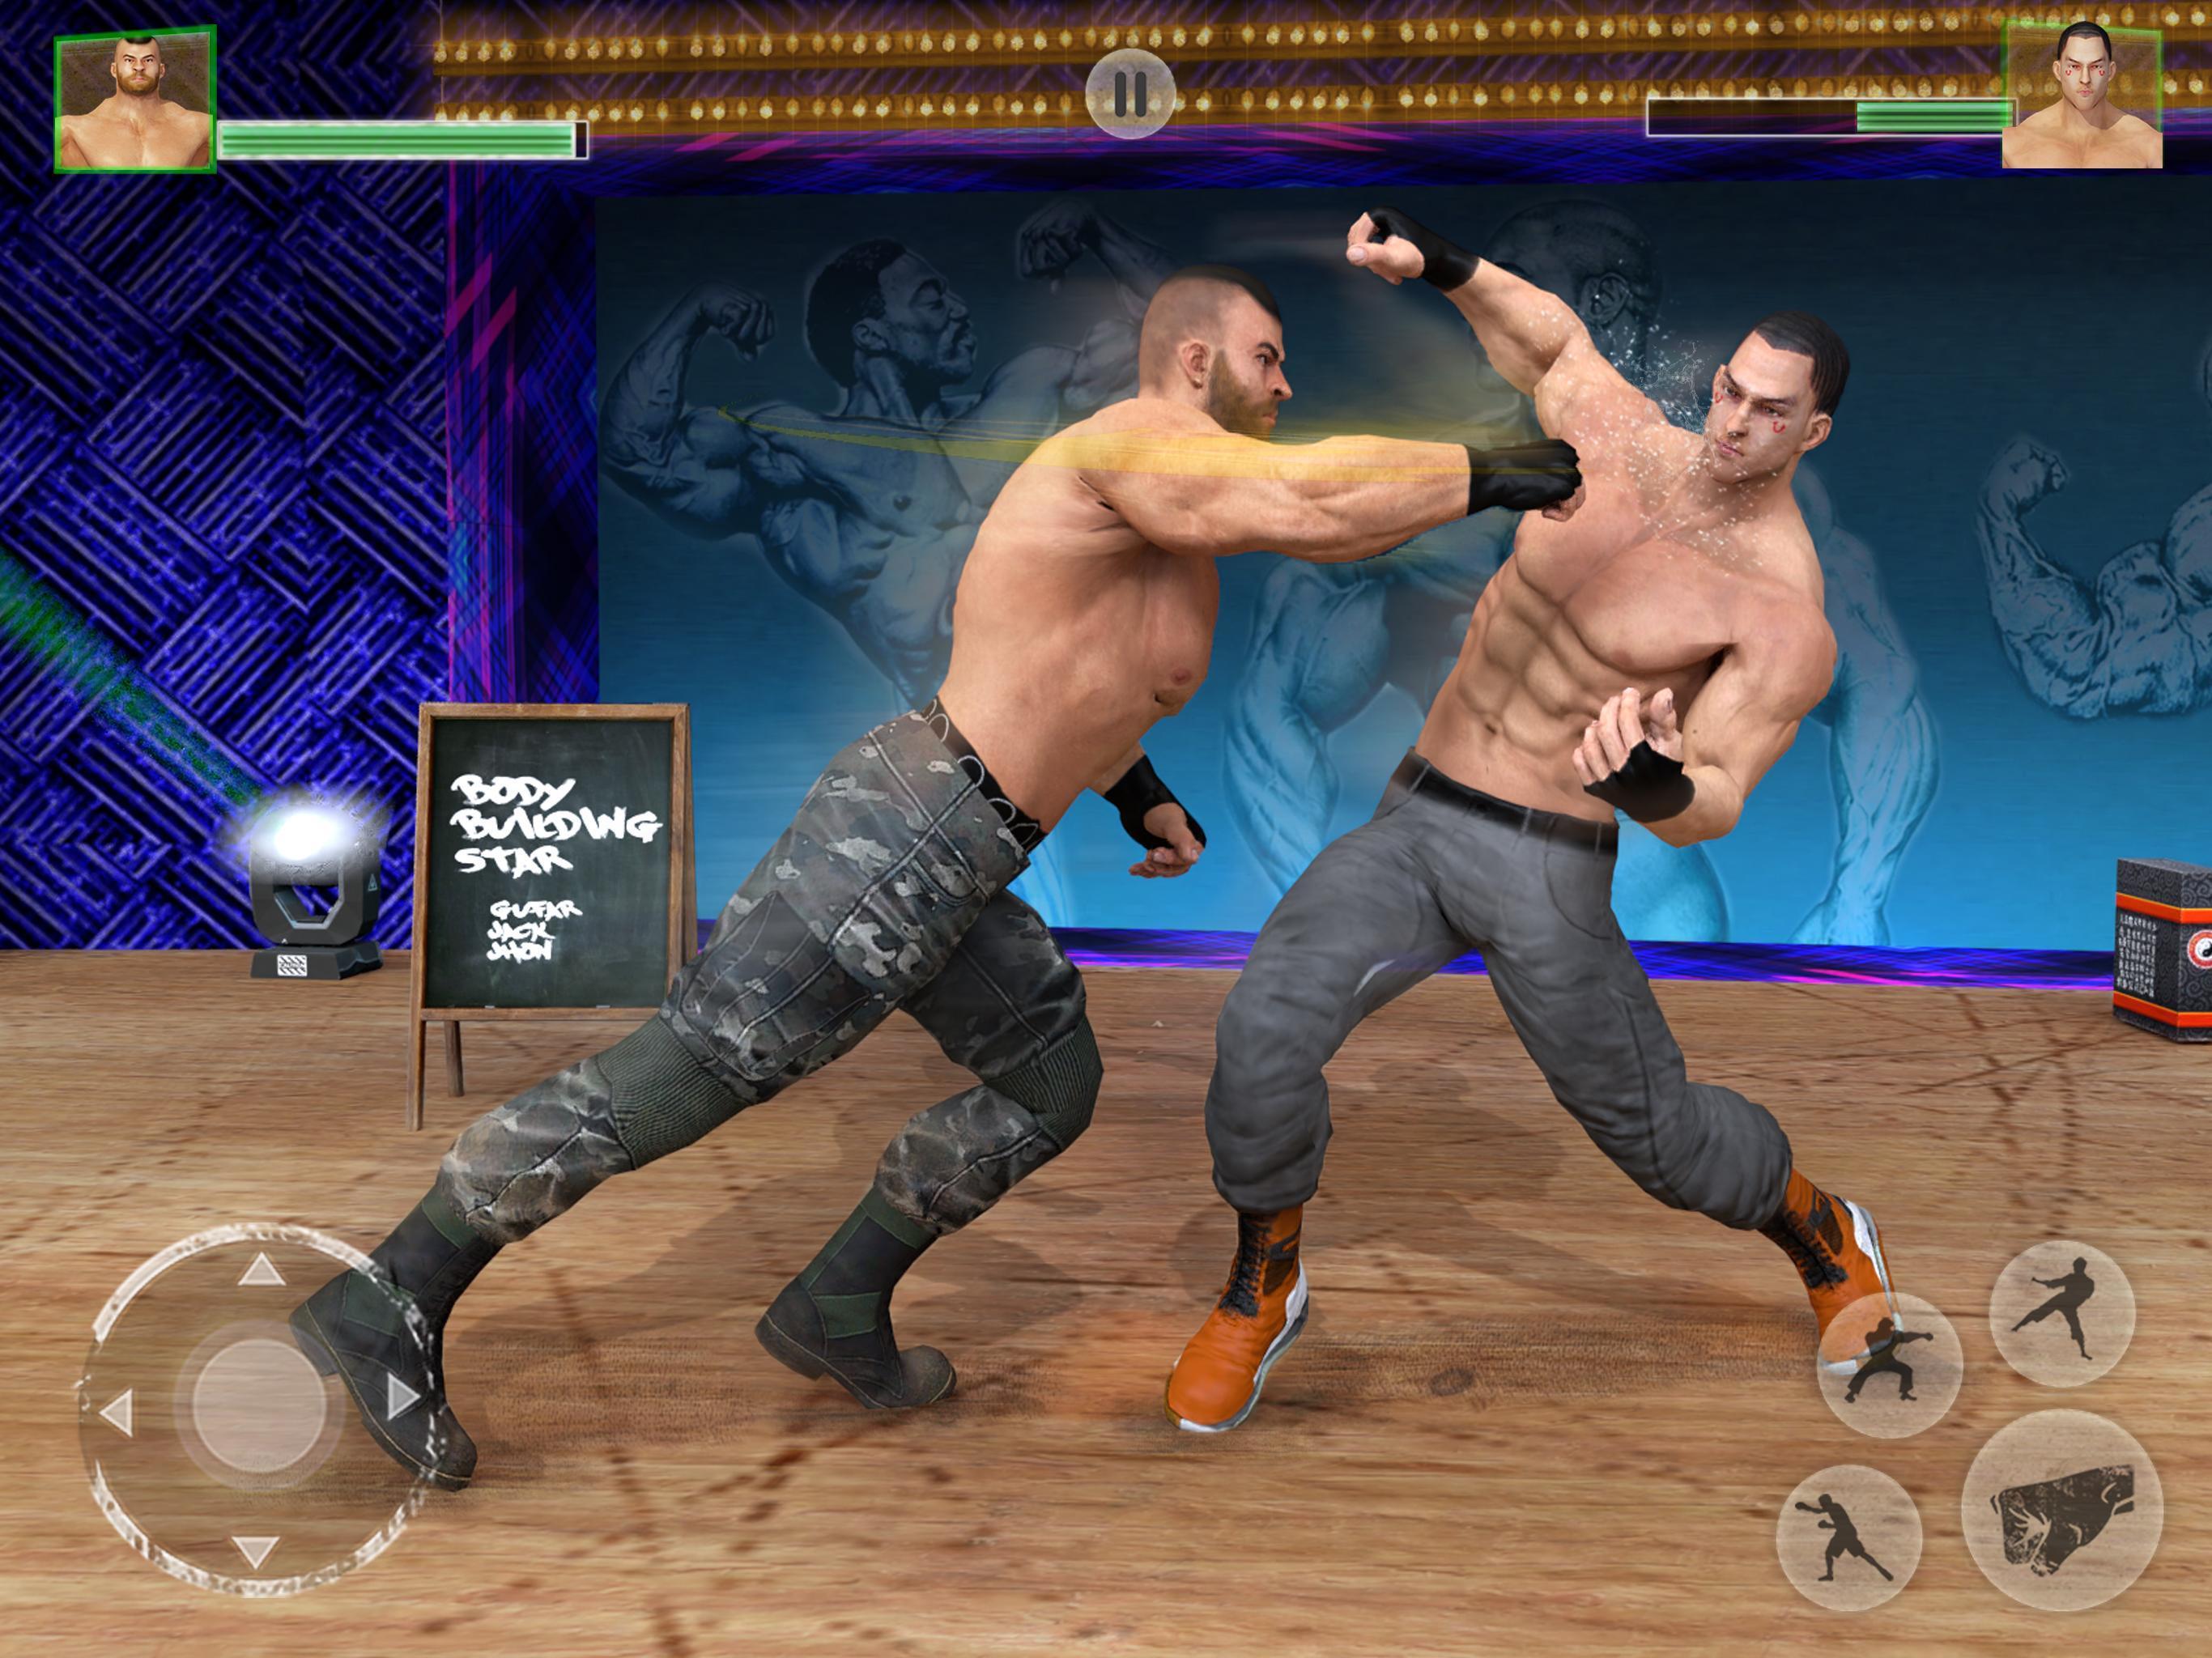 Bodybuilder Fighting Club 2019: Wrestling Games 1.1.4 Screenshot 6